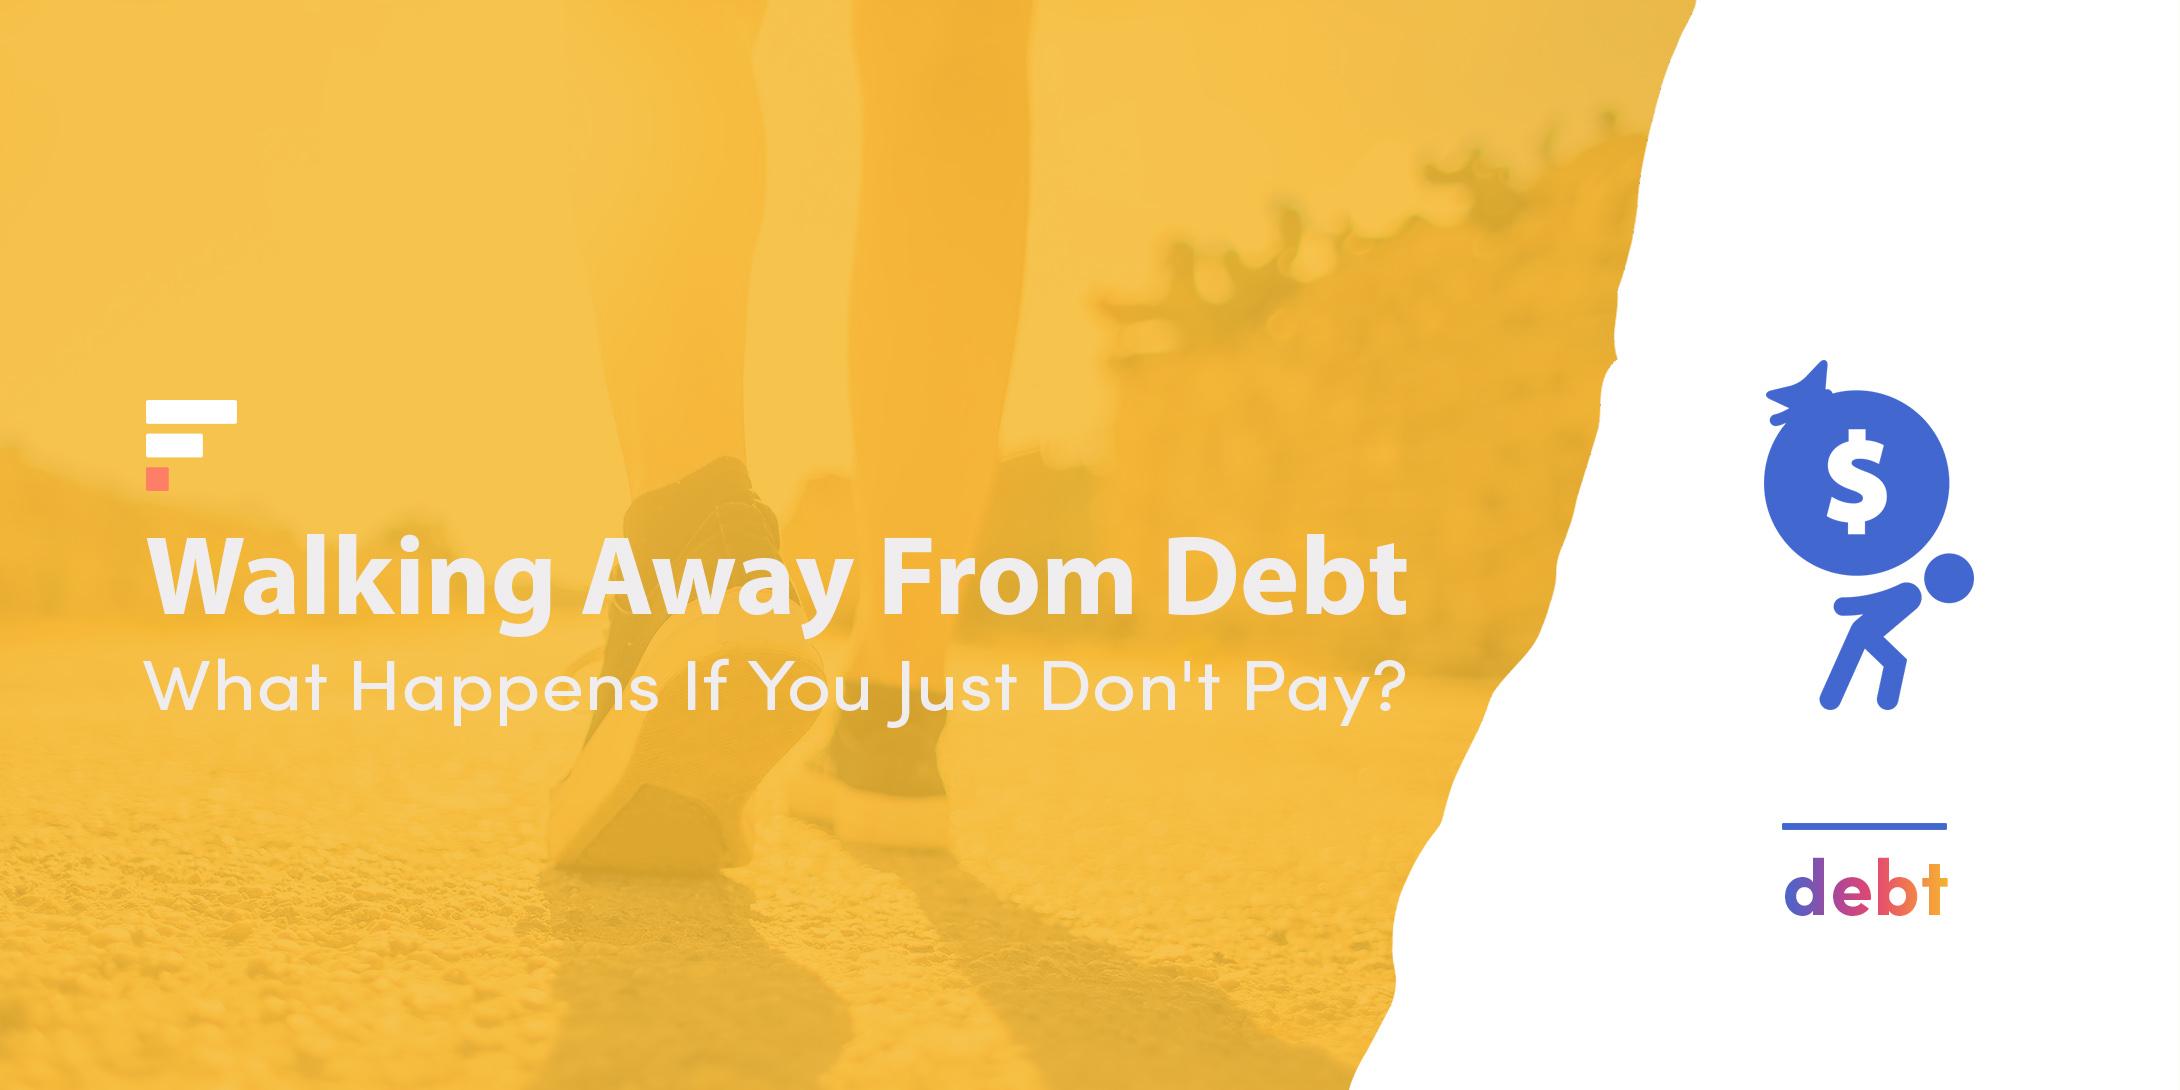 Walking away from debt